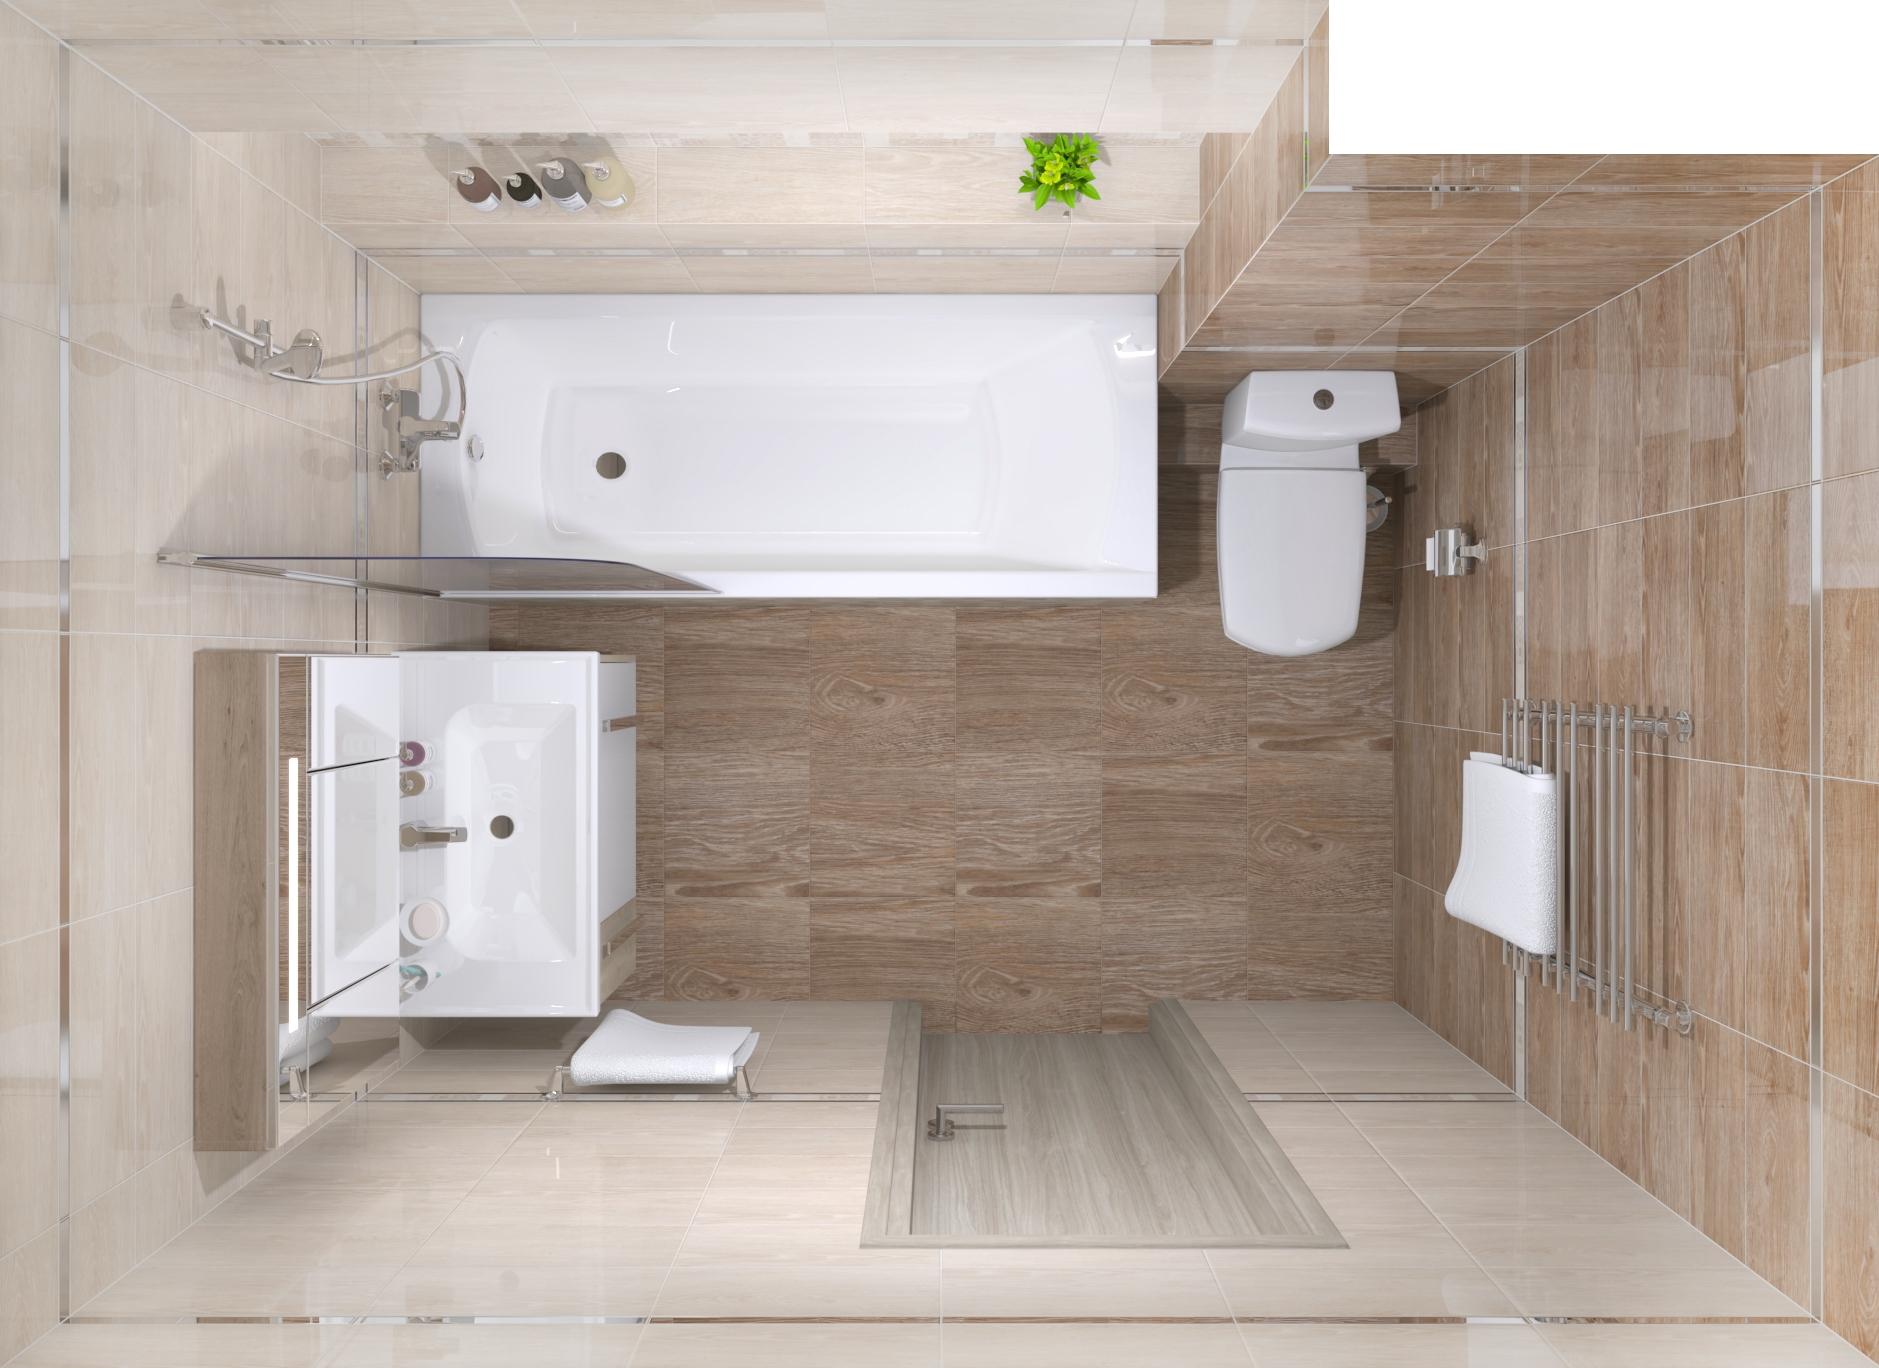 Раскладка плитки в ванной и туалете